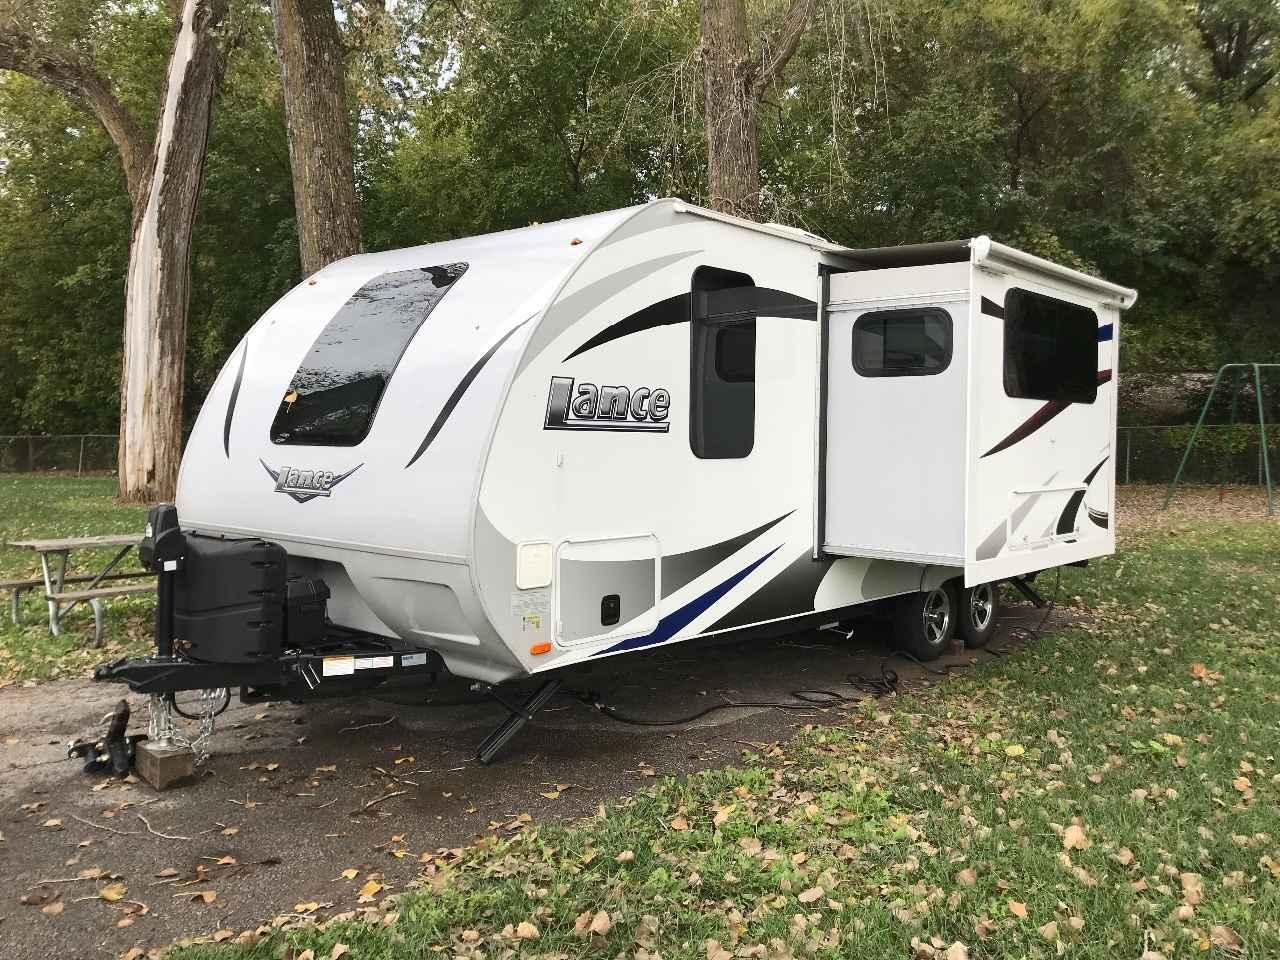 2017 Used Lance 2185 Travel Trailer in Kansas KS